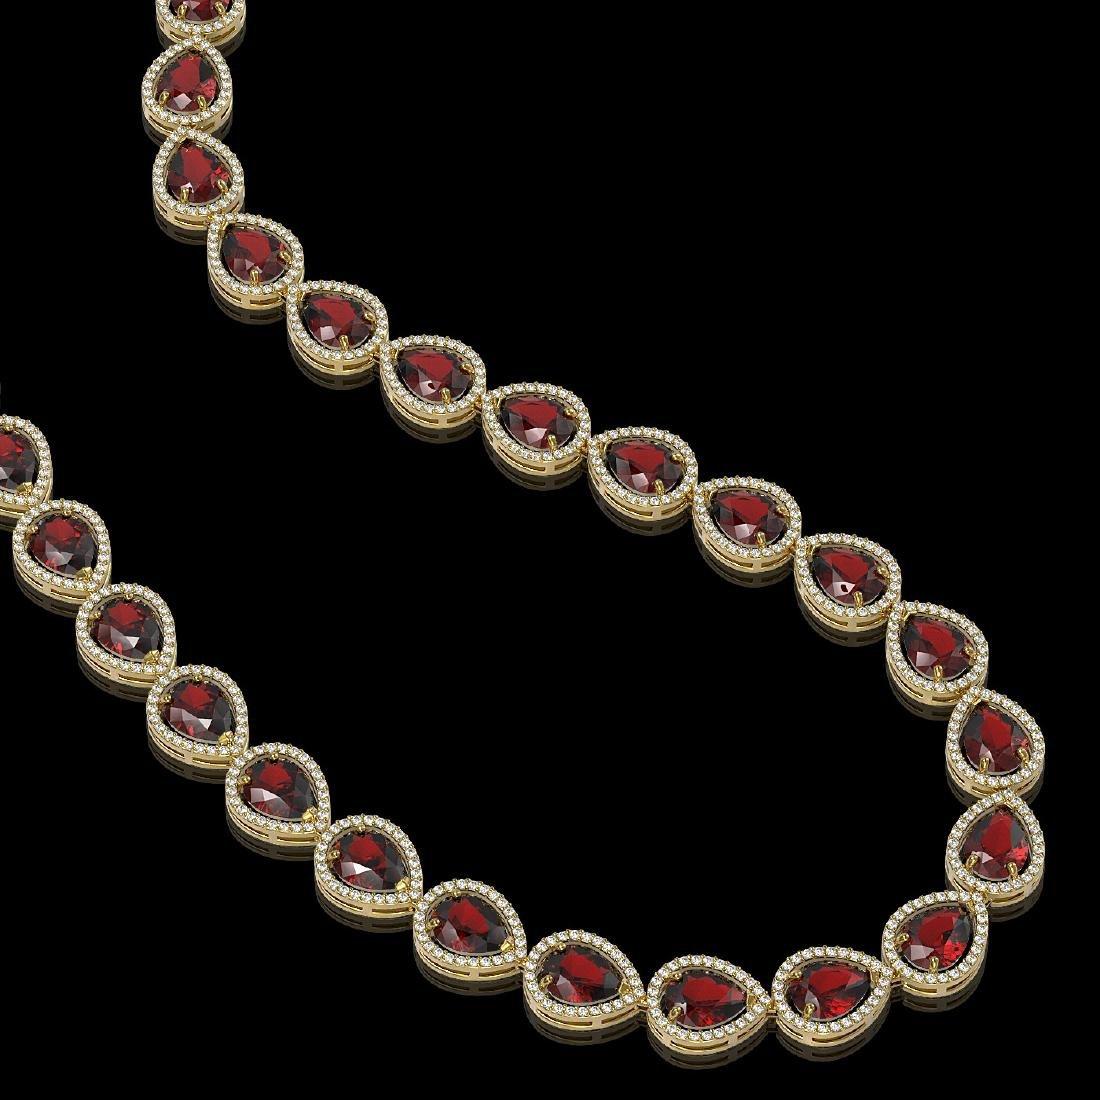 36.8 CTW Garnet & Diamond Halo Necklace 10K Yellow Gold - 2